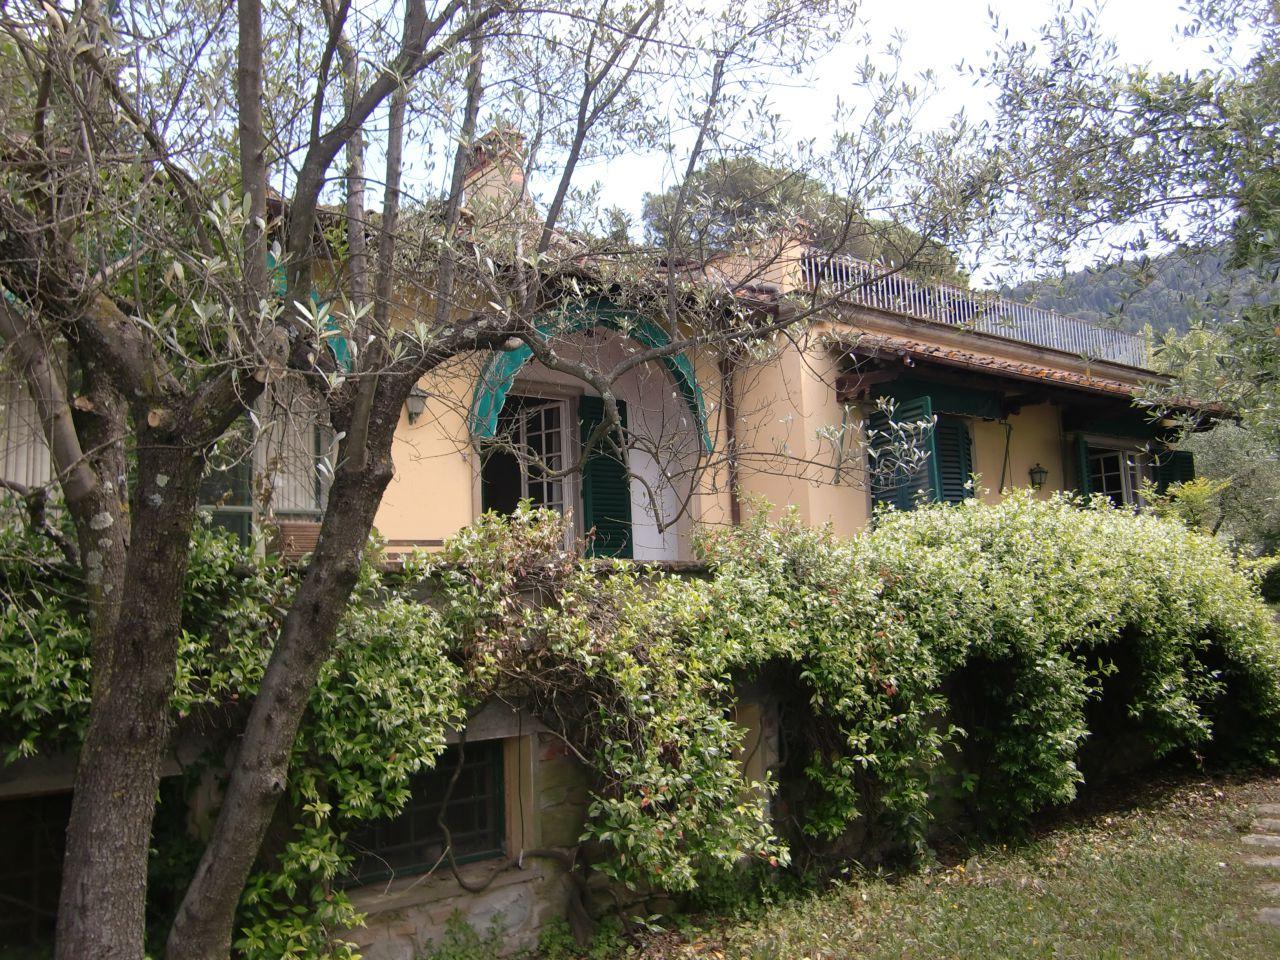 firenze vendita quart: san domenico studio immobiliare florenzi di giacomo bianchi